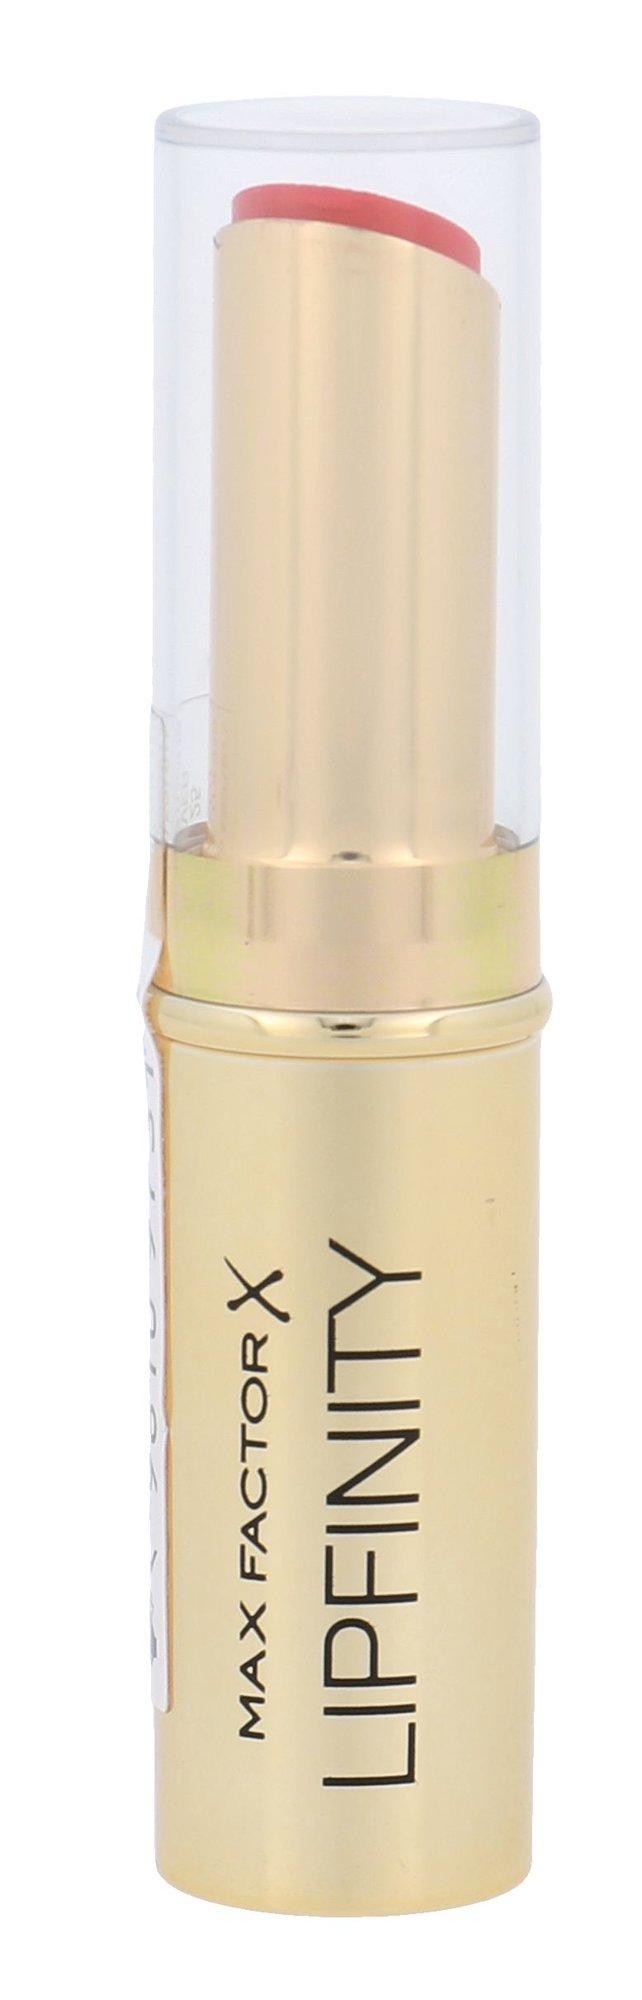 Max Factor Lipfinity Cosmetic 3,4ml 25 Ever Sumptuous